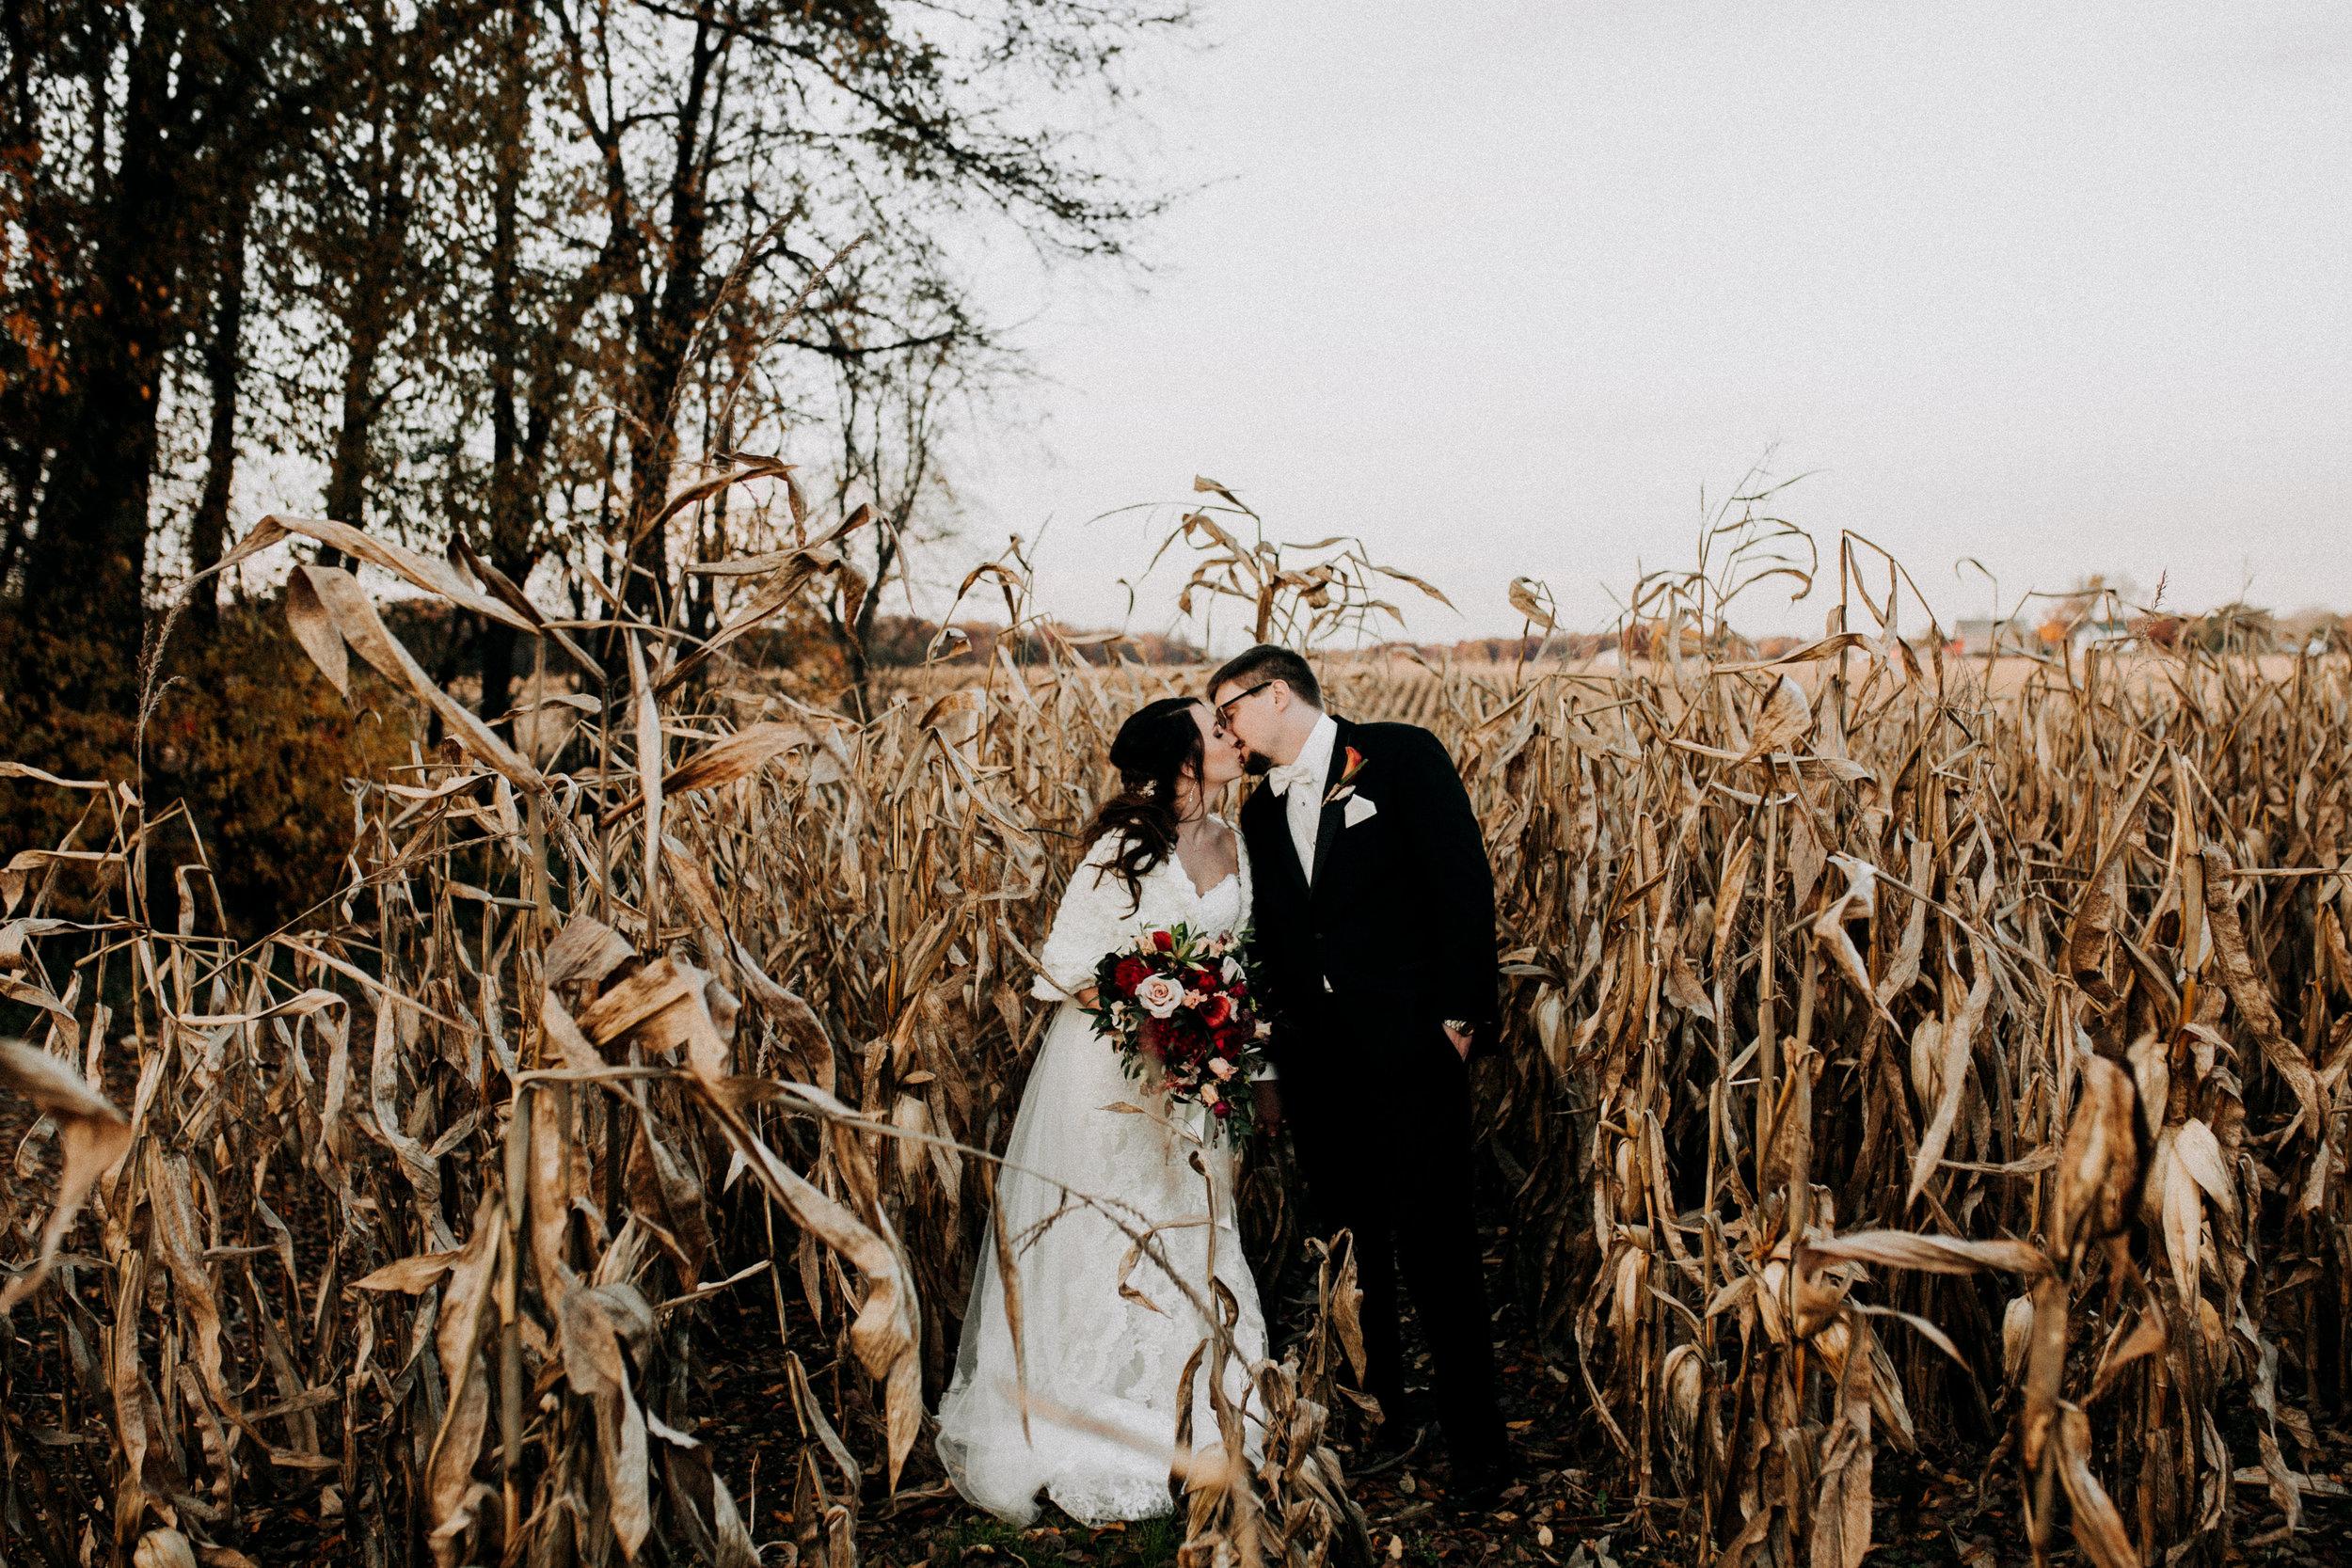 ivory crochet shawl vintage wedding cape bridal bolero 6.jpg